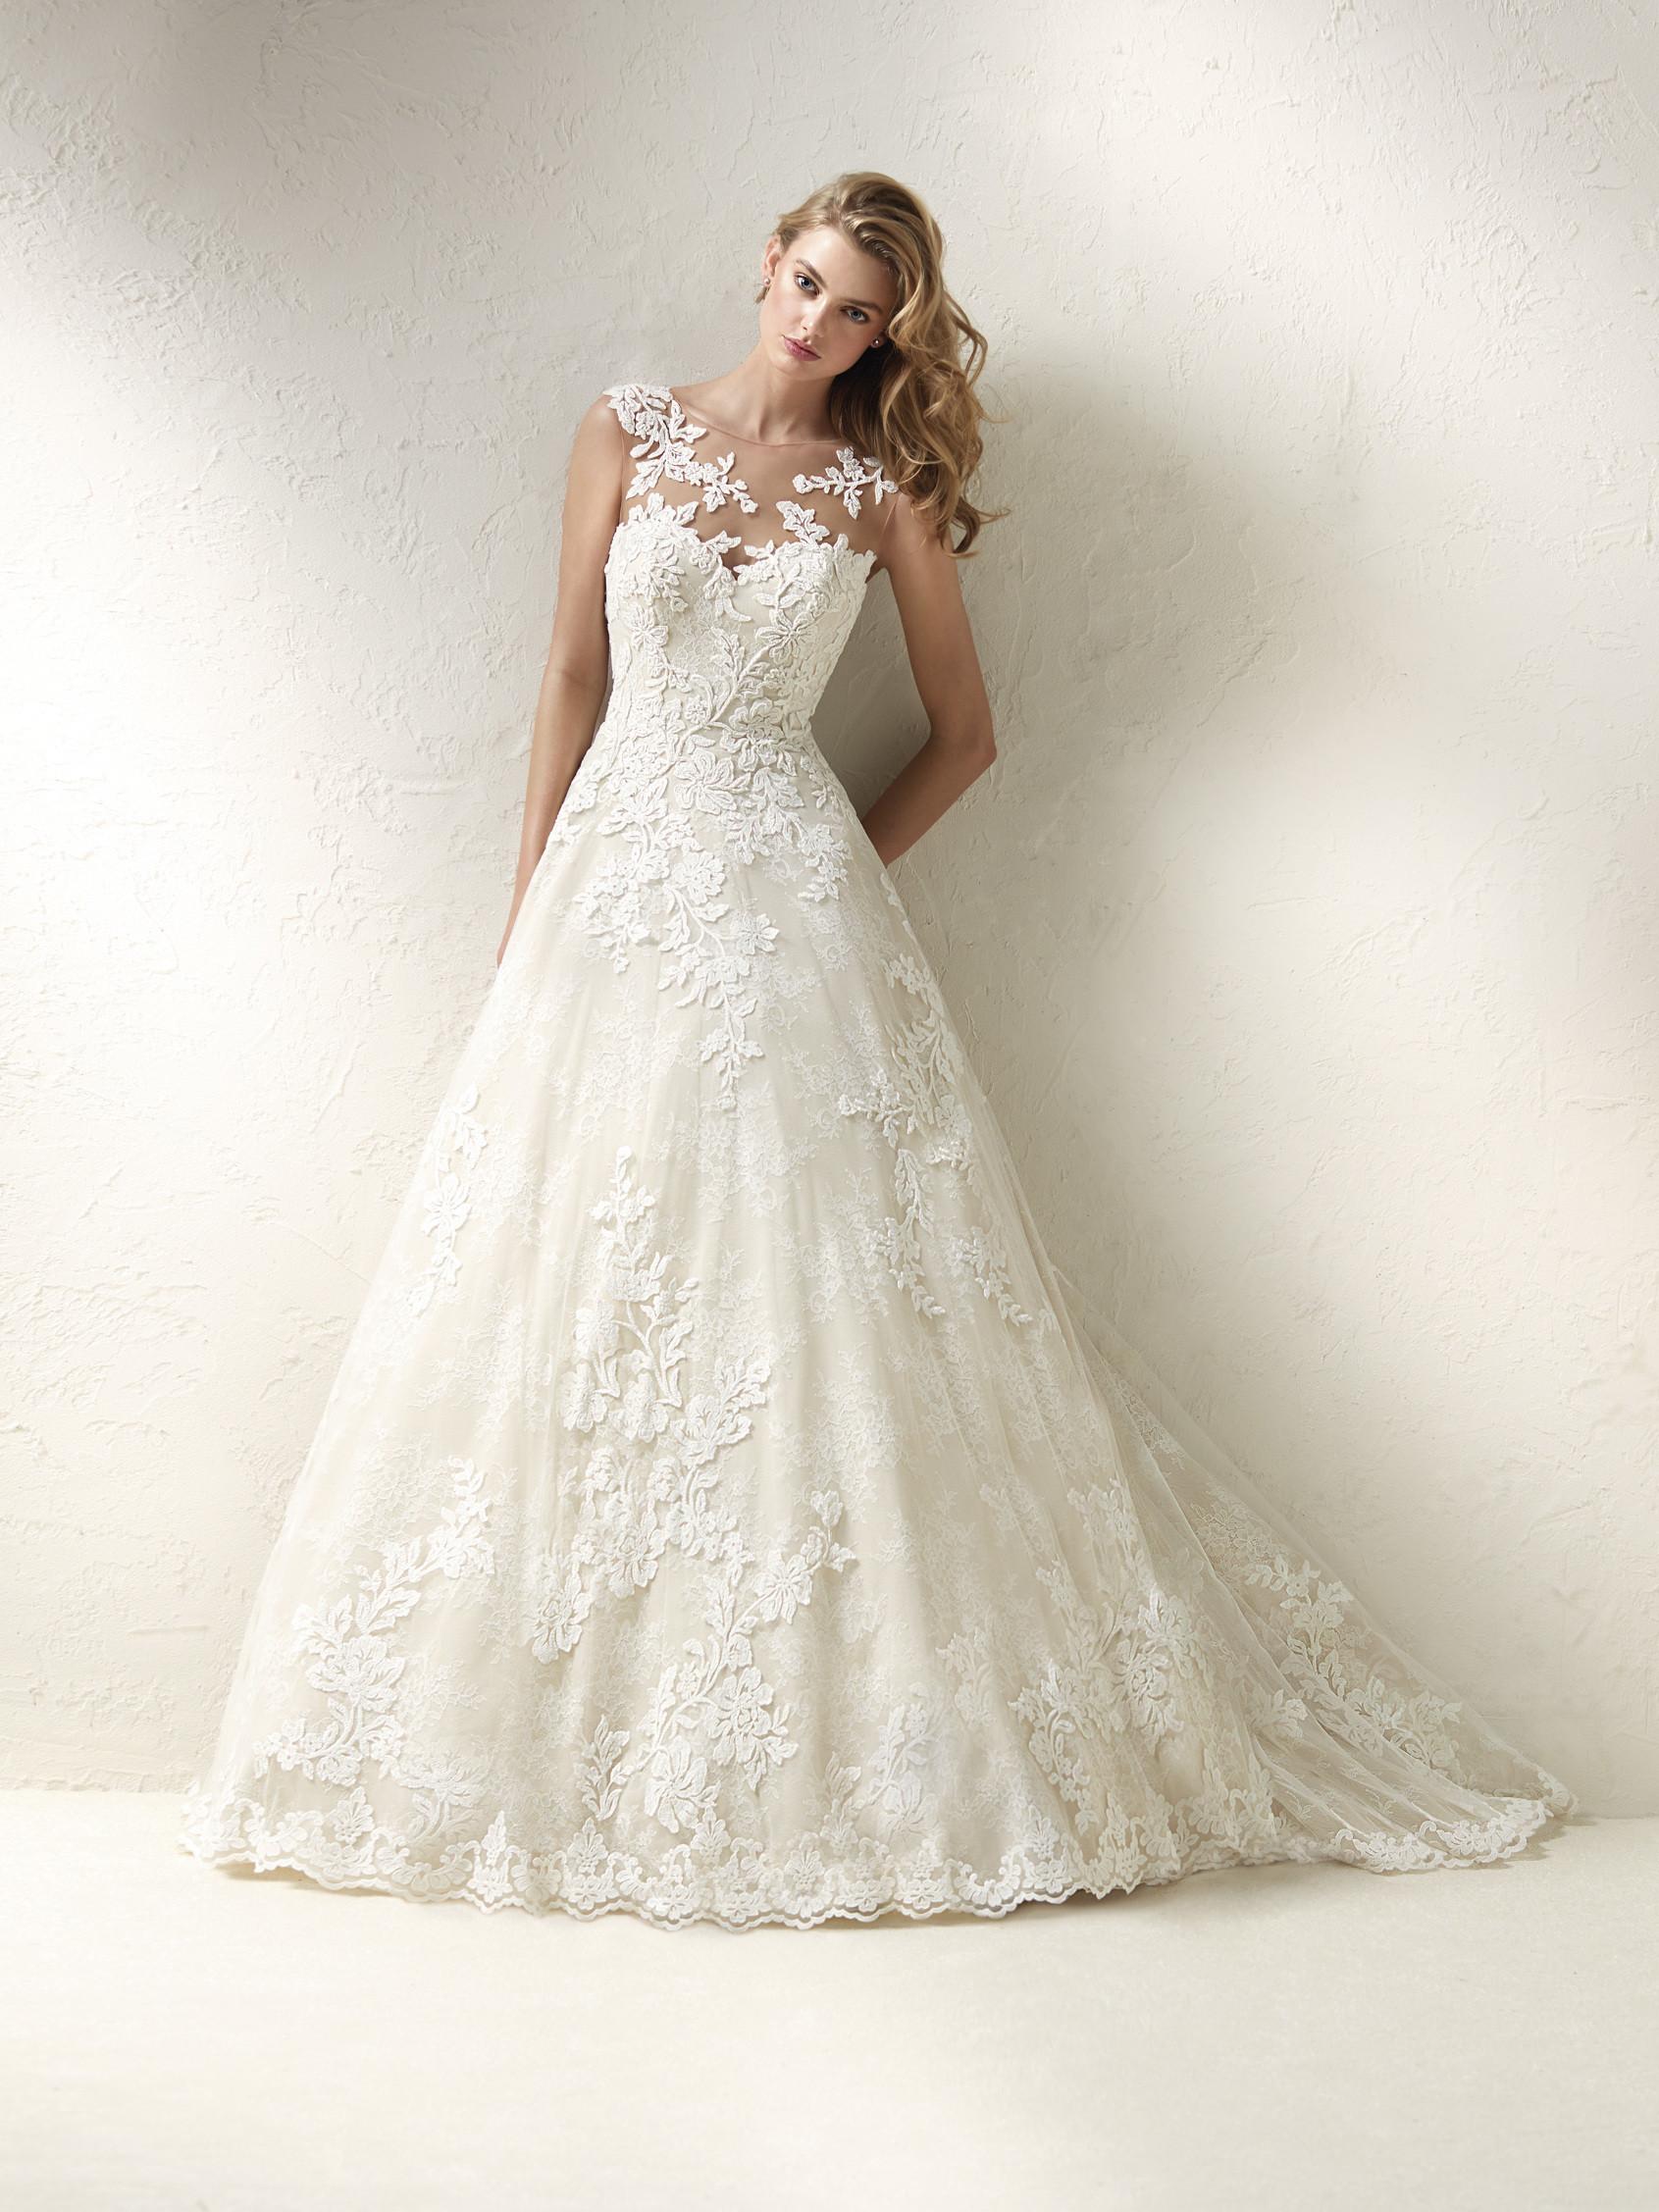 Romantic Ball Gown Wedding Dress  Kleinfeld Bridal